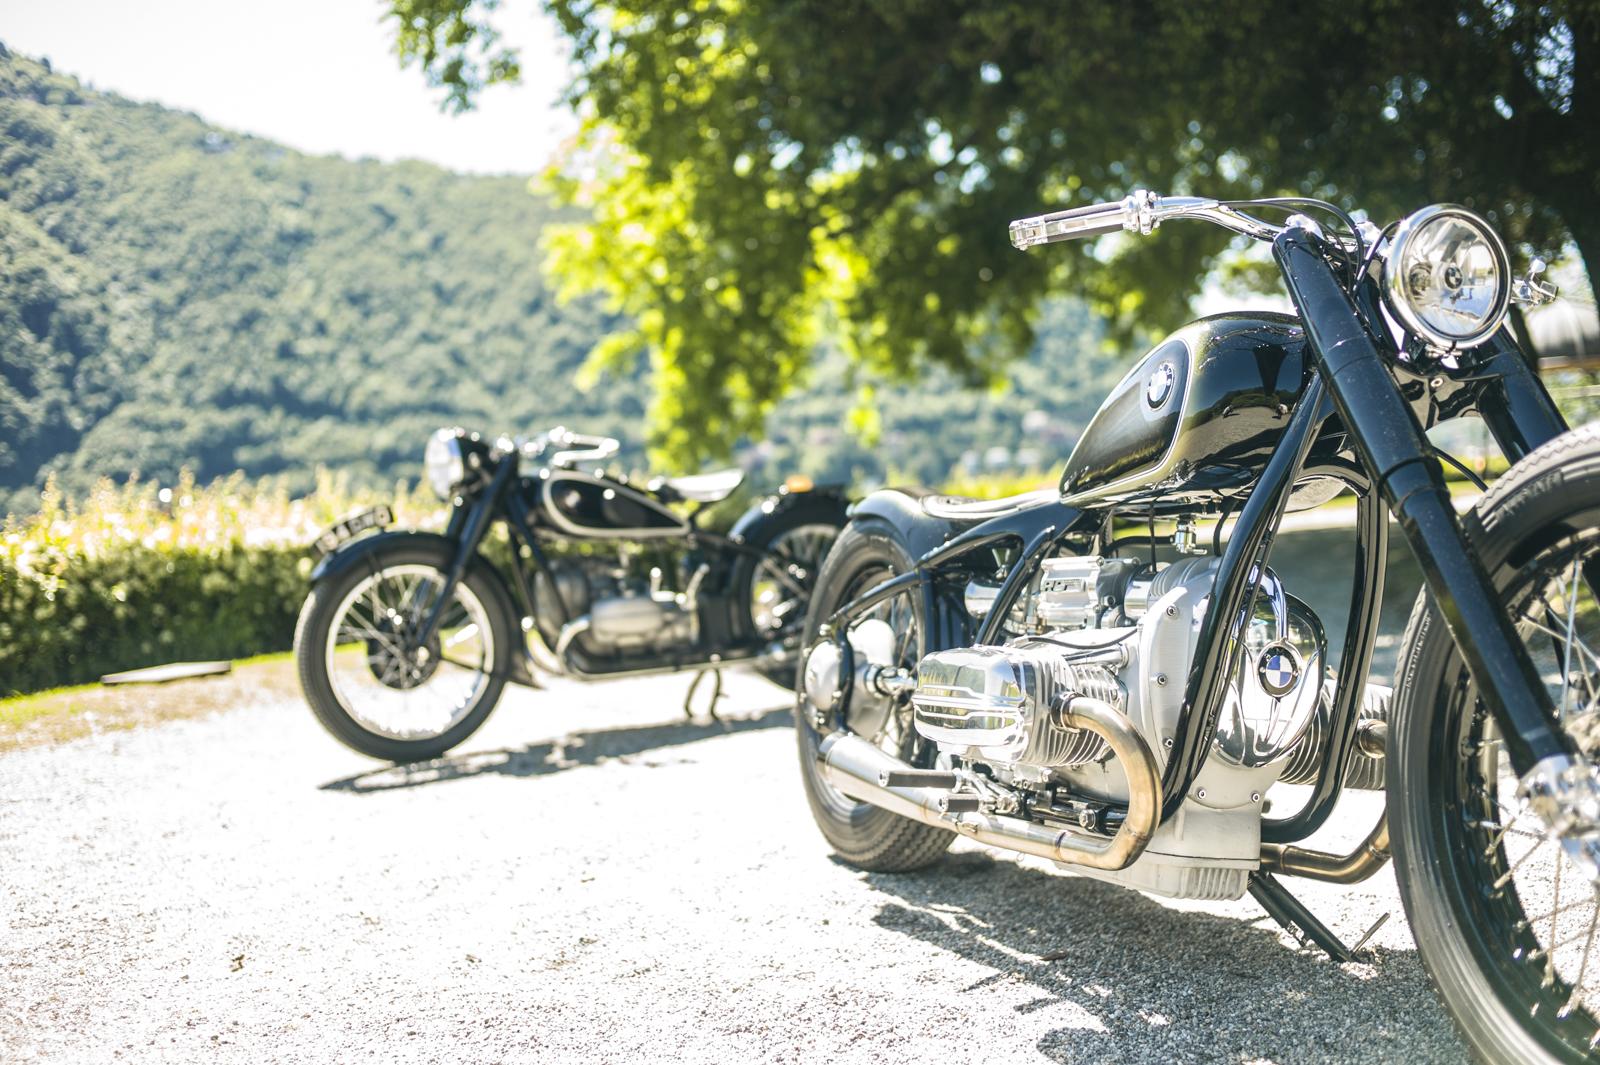 bmw-r5-hommage-bike-villa-deste-3-autonovosti.me-1